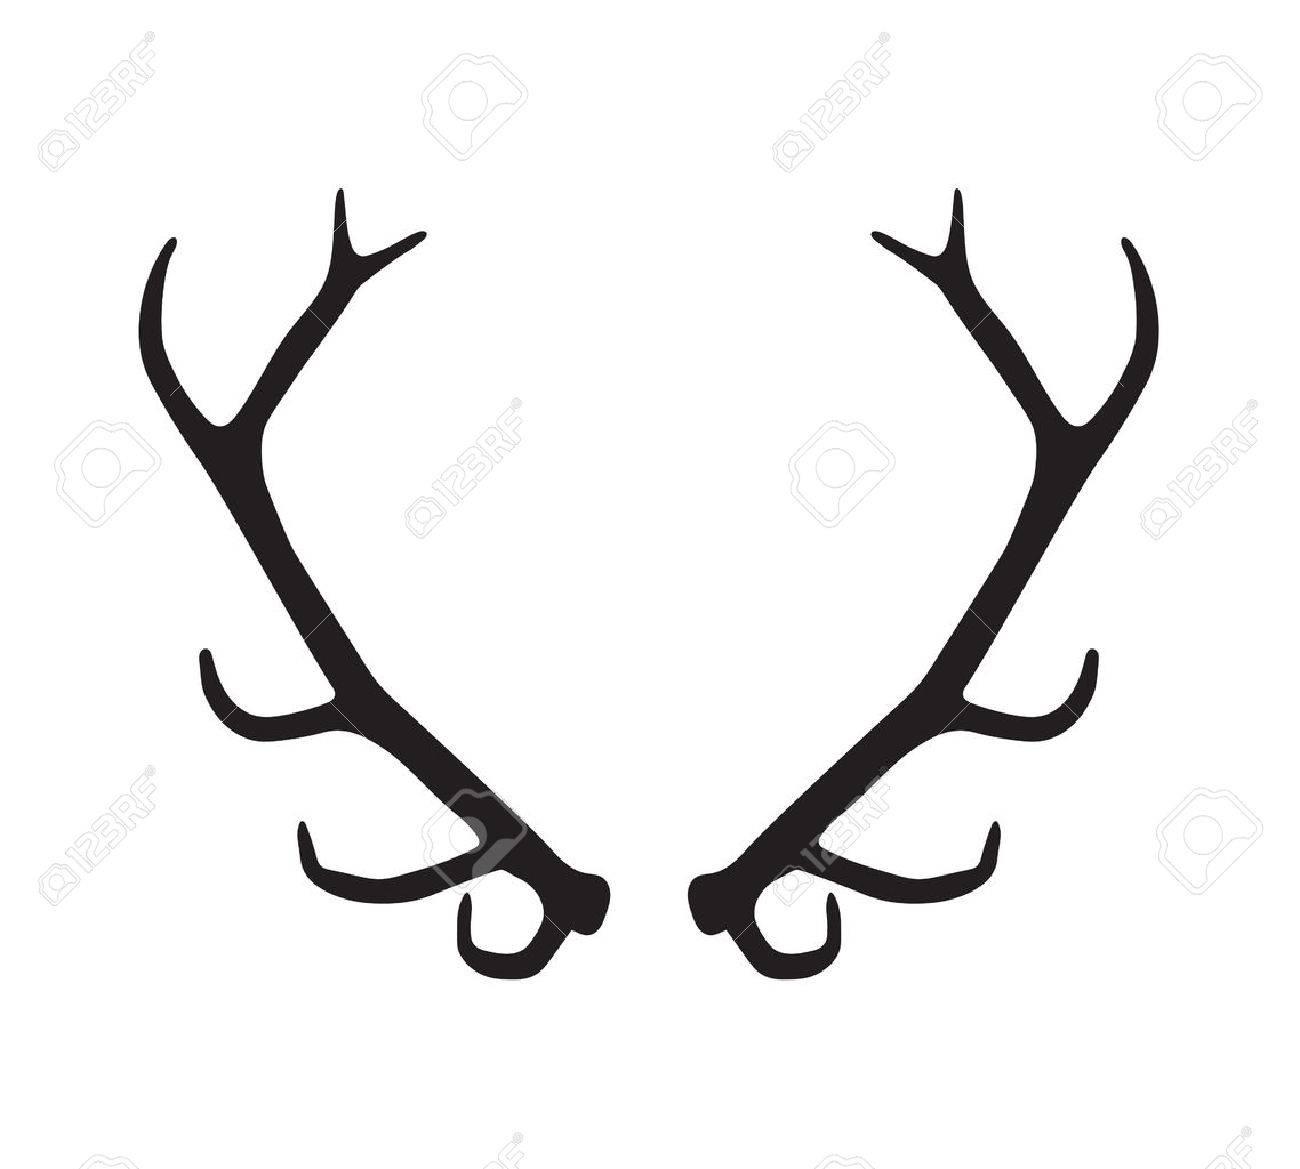 black silhouette of antlers - 45520948